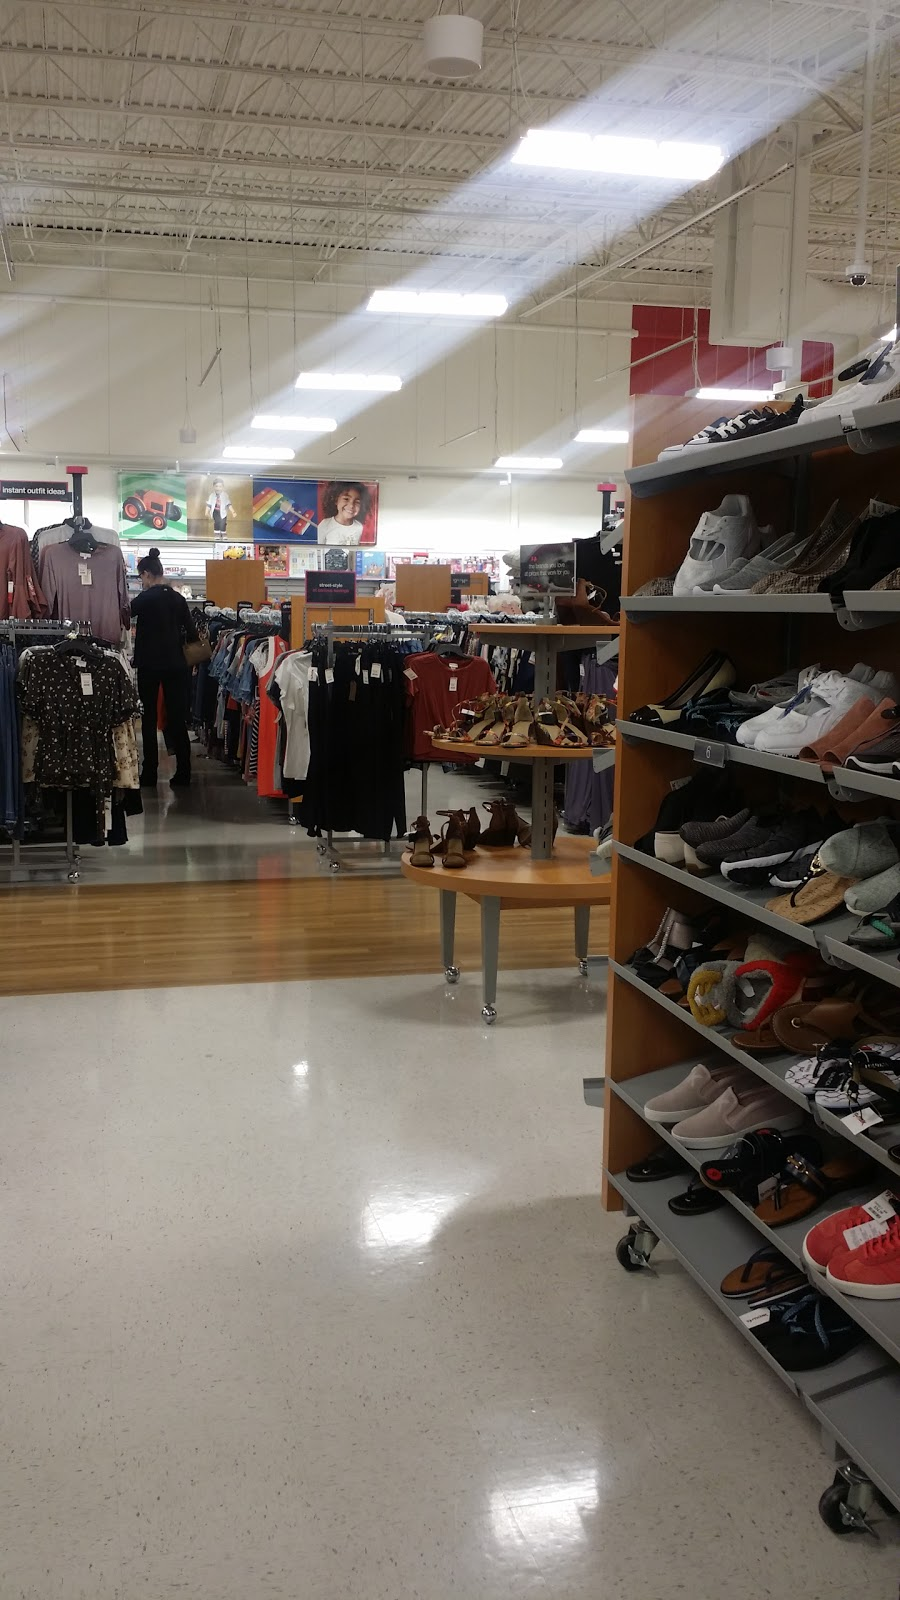 T.J. Maxx - clothing store  | Photo 5 of 10 | Address: 78-825 CA-111, La Quinta, CA 92253, USA | Phone: (760) 564-2885